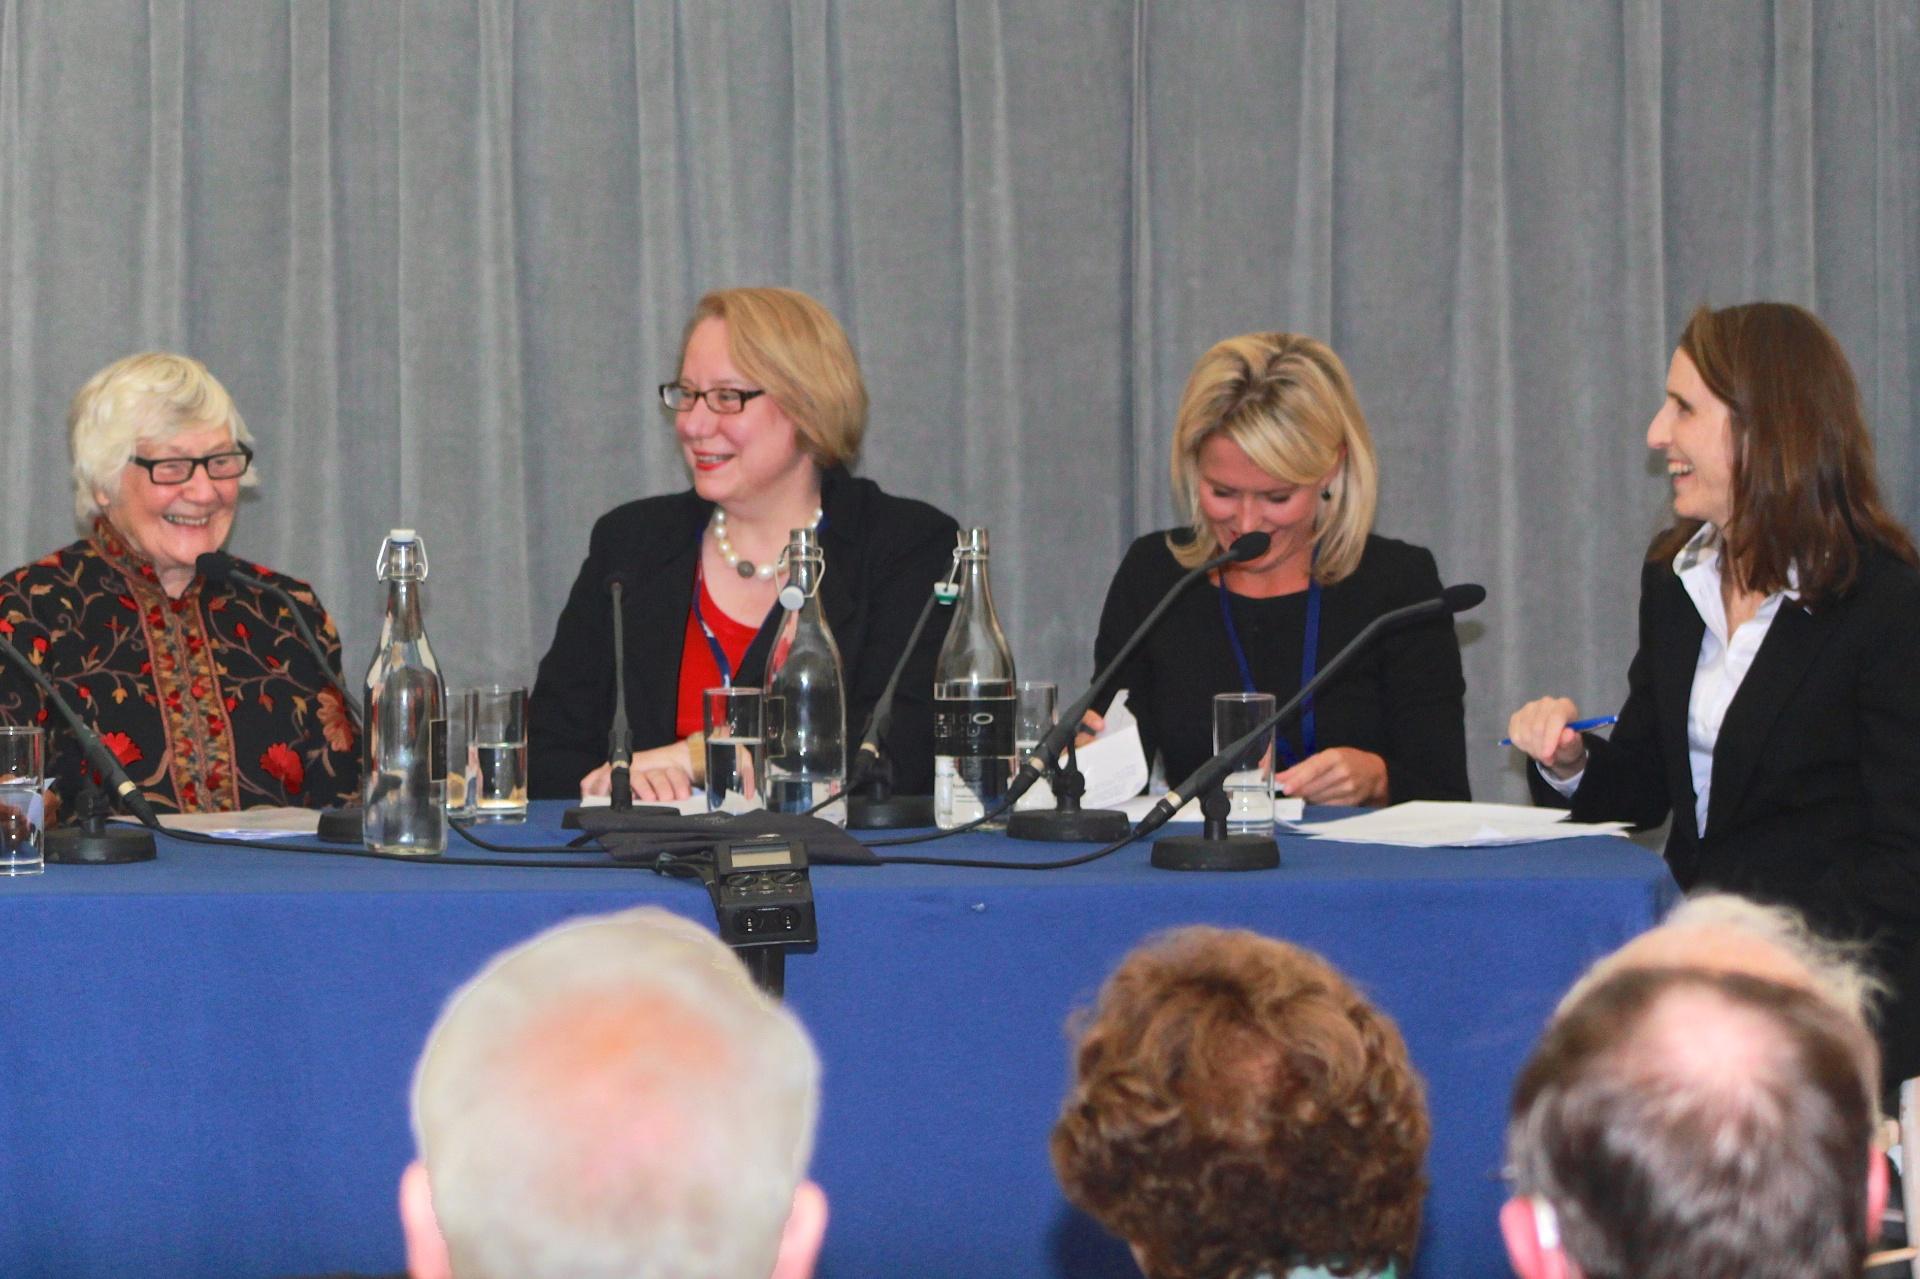 Panelists Dame Shirley Williams, Ann Olivarius, Jennifer Robinson and Michele Warman